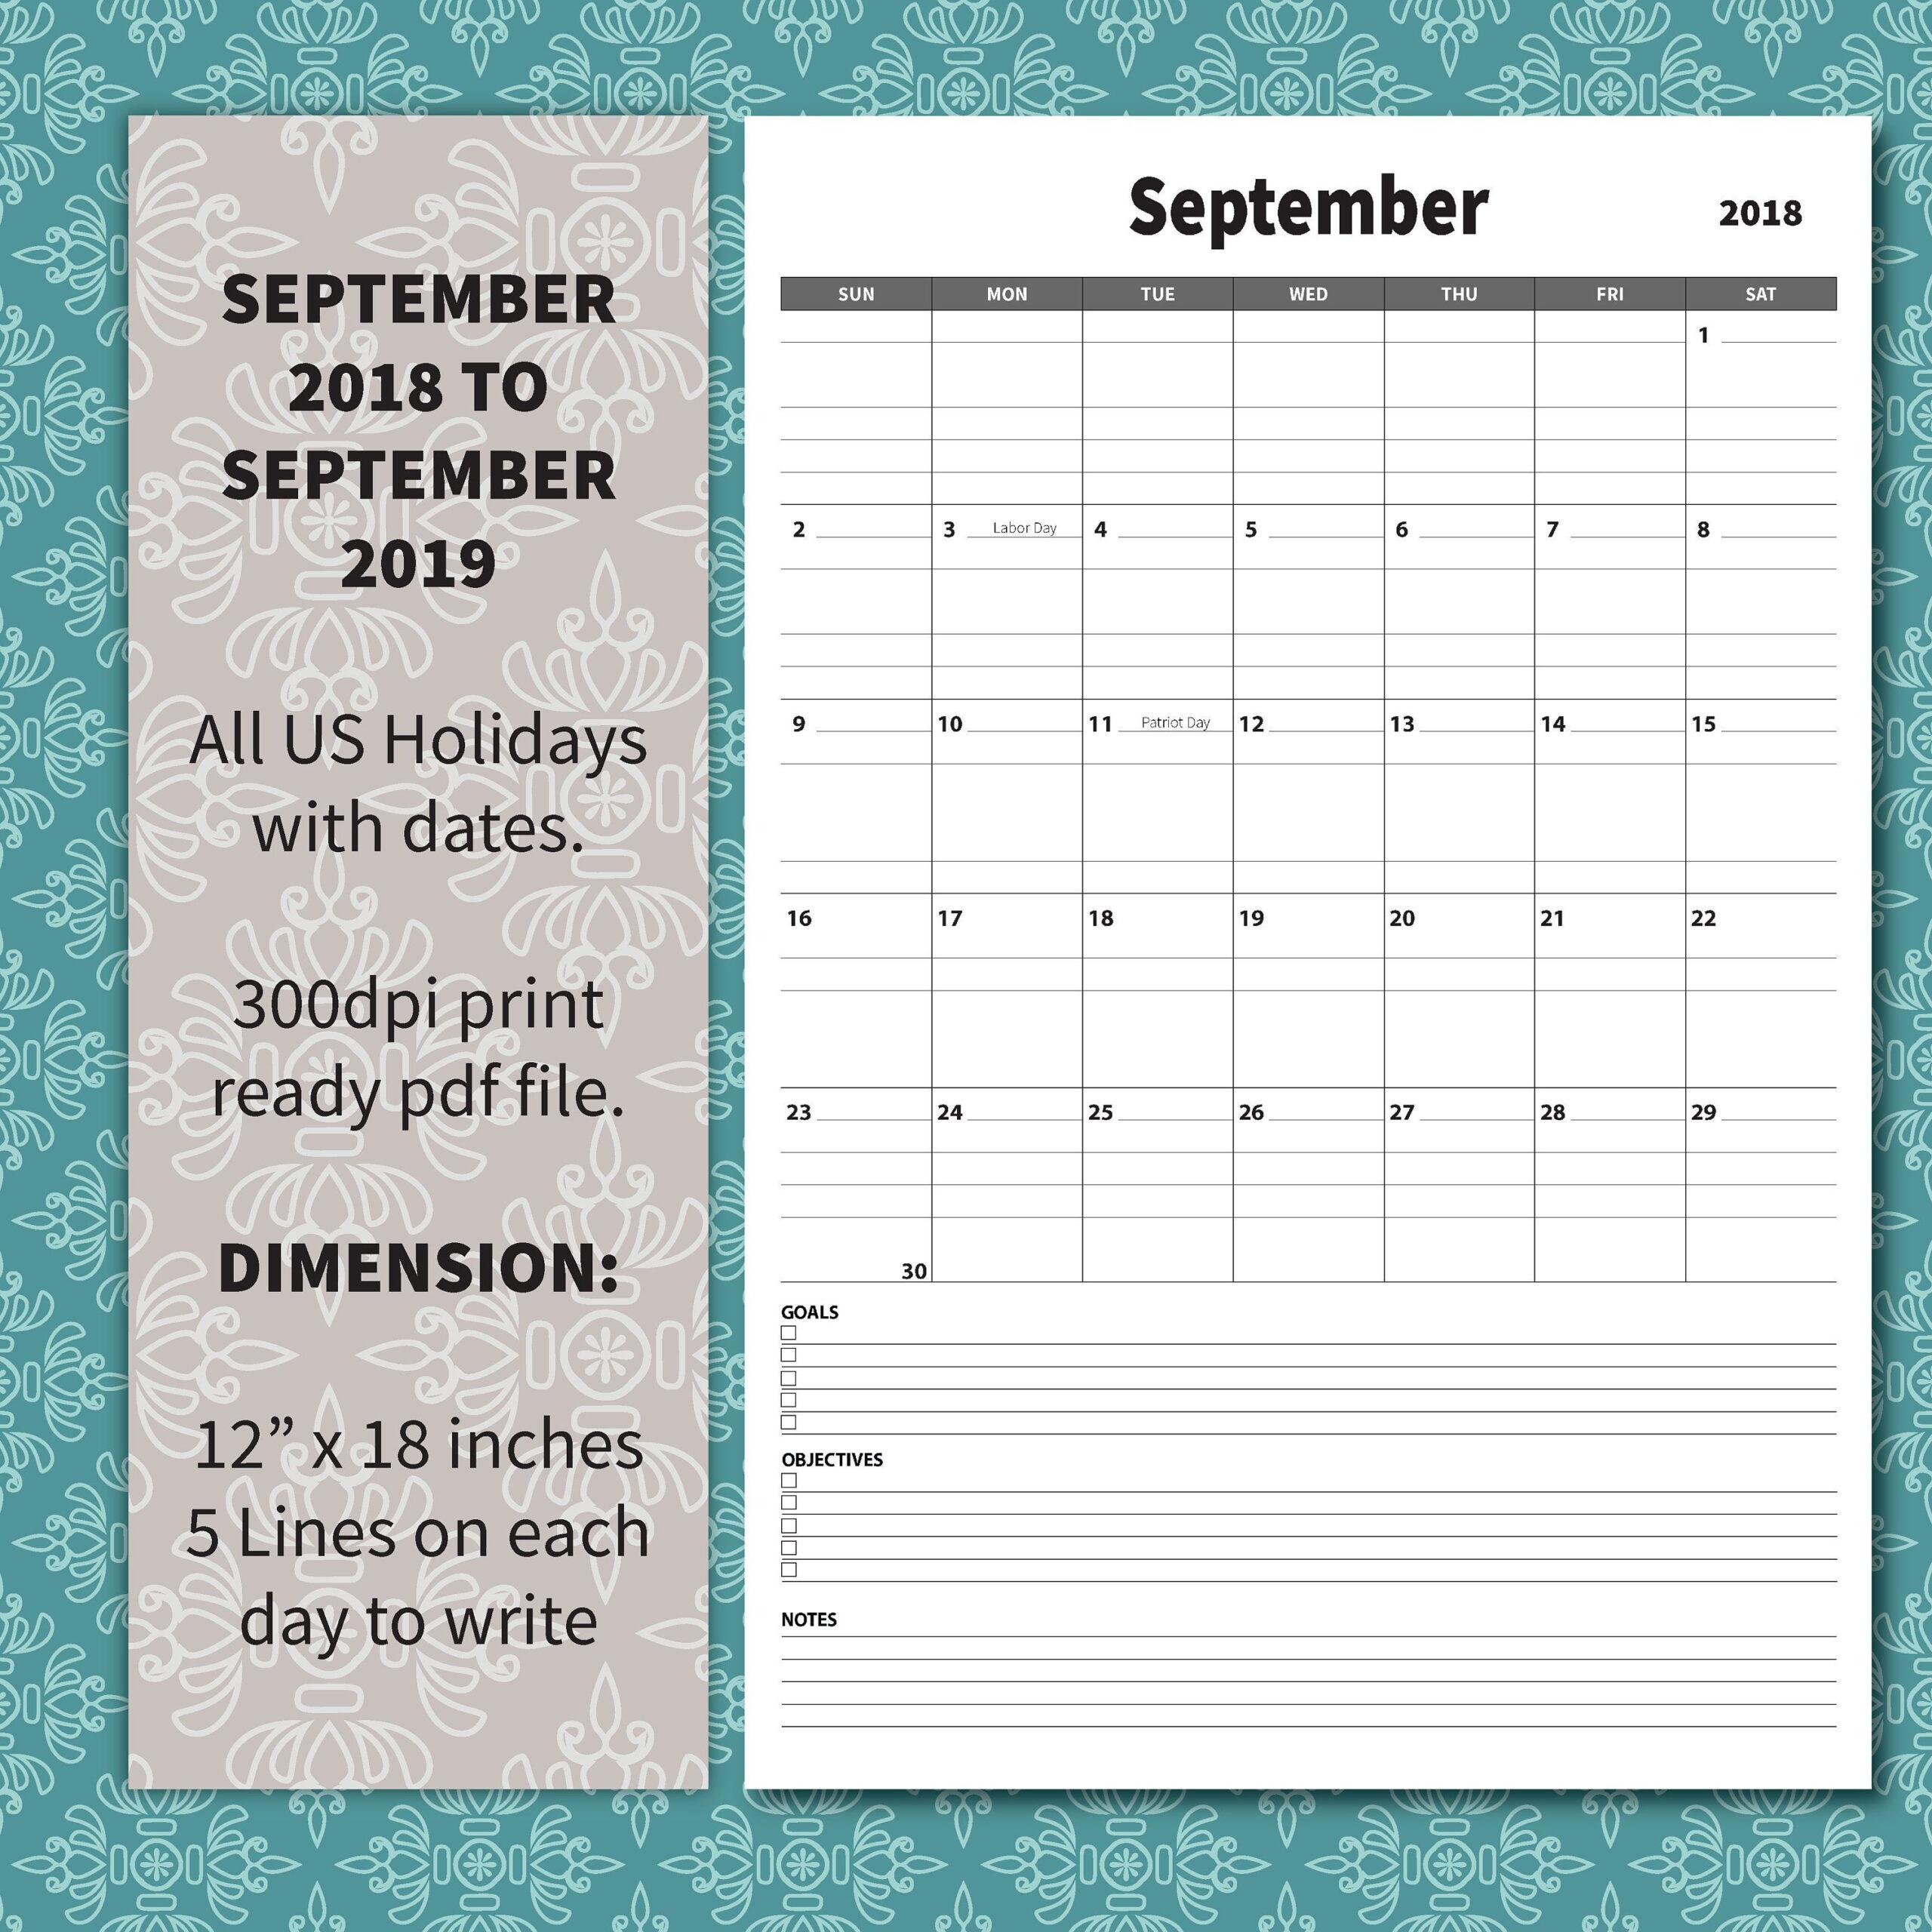 Deepika Calendar 2019 - Free Download Printable Calendar